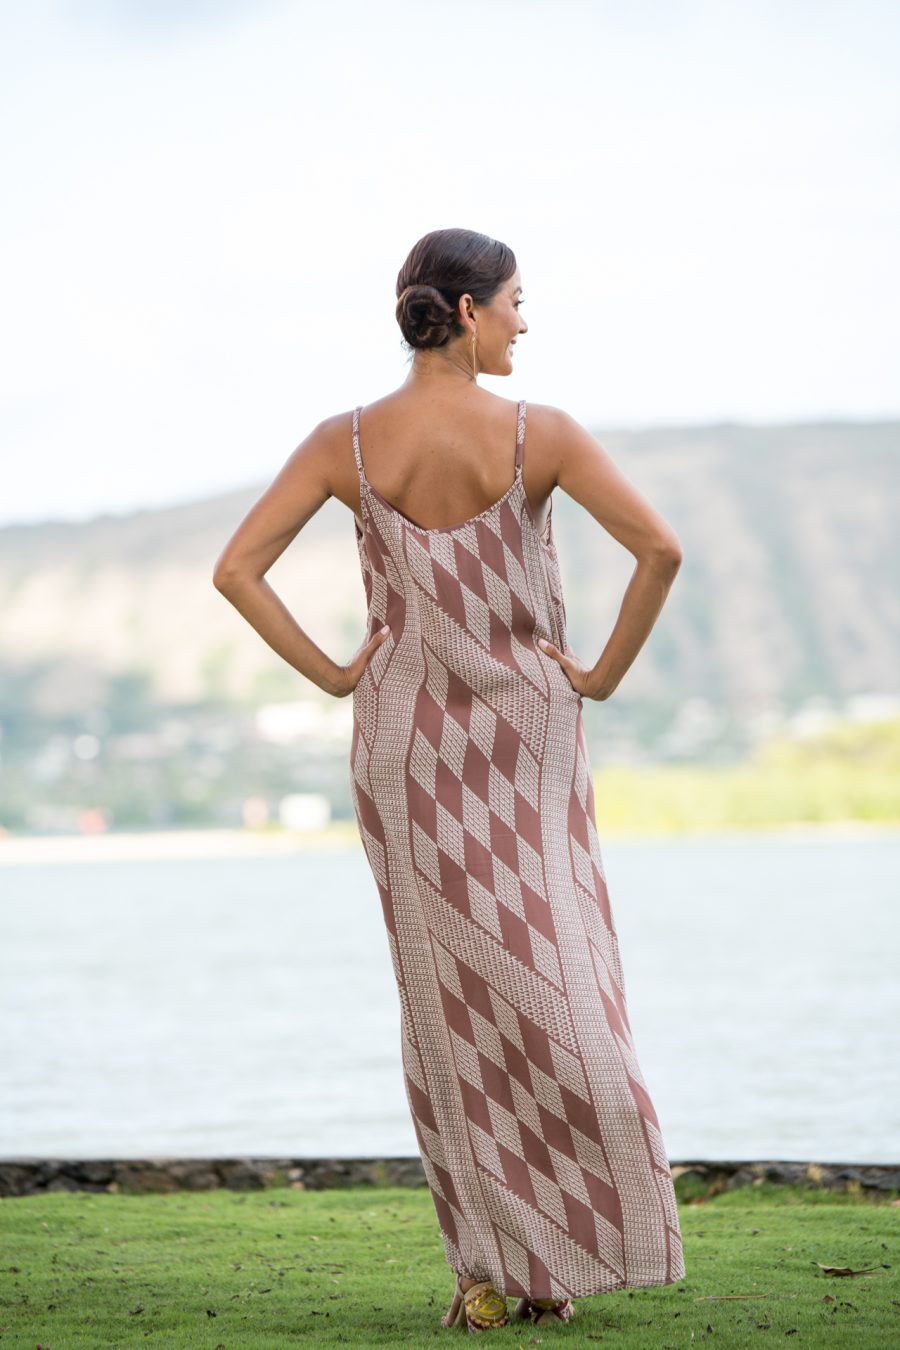 Model wearing Uluniu Maxi Dress in Fired Brick White Kamehameha Pattern - Back View